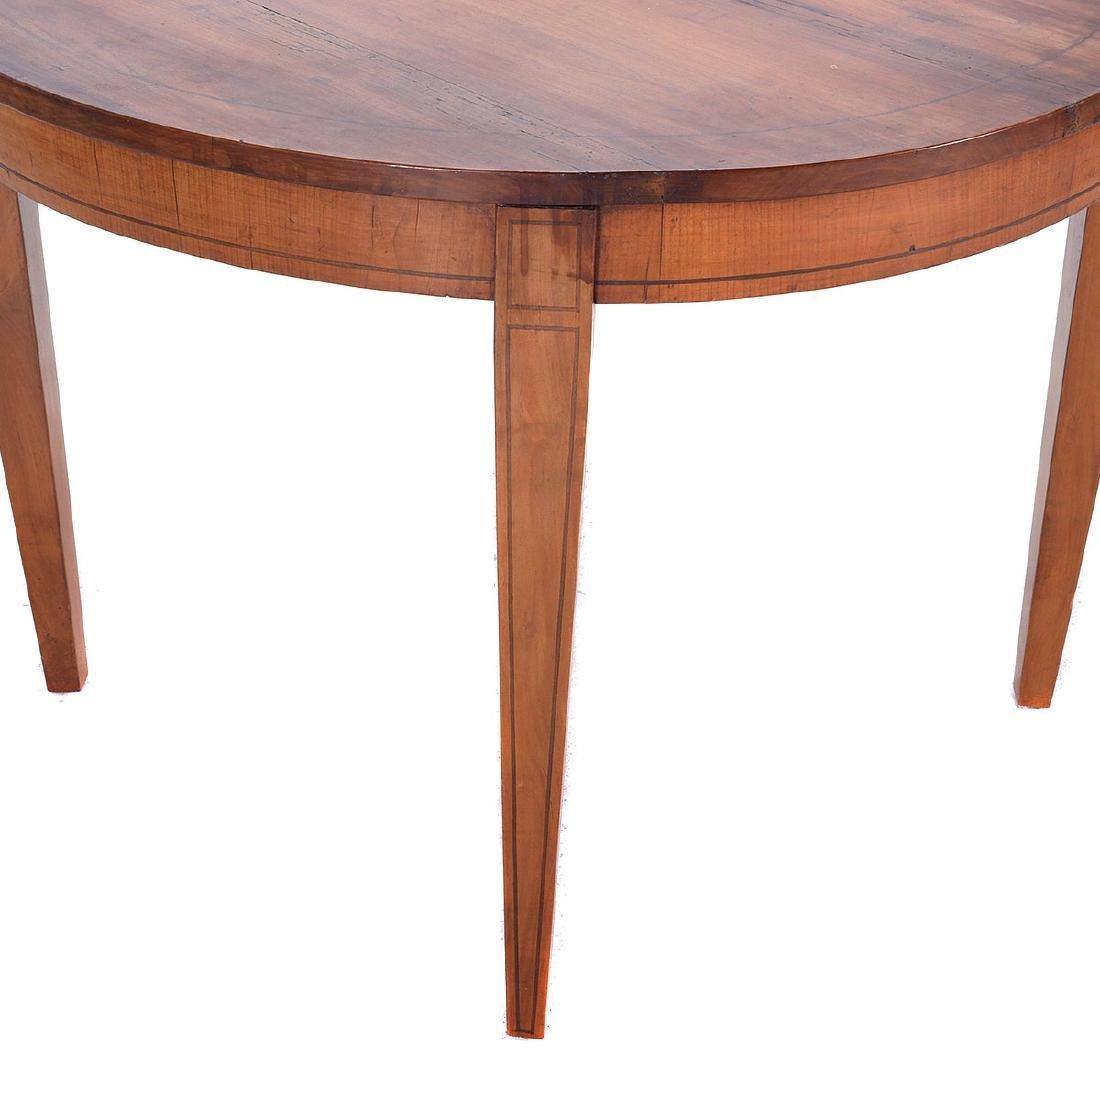 Italian Neoclassical Style Inlaid Fruitwood Circular - 3